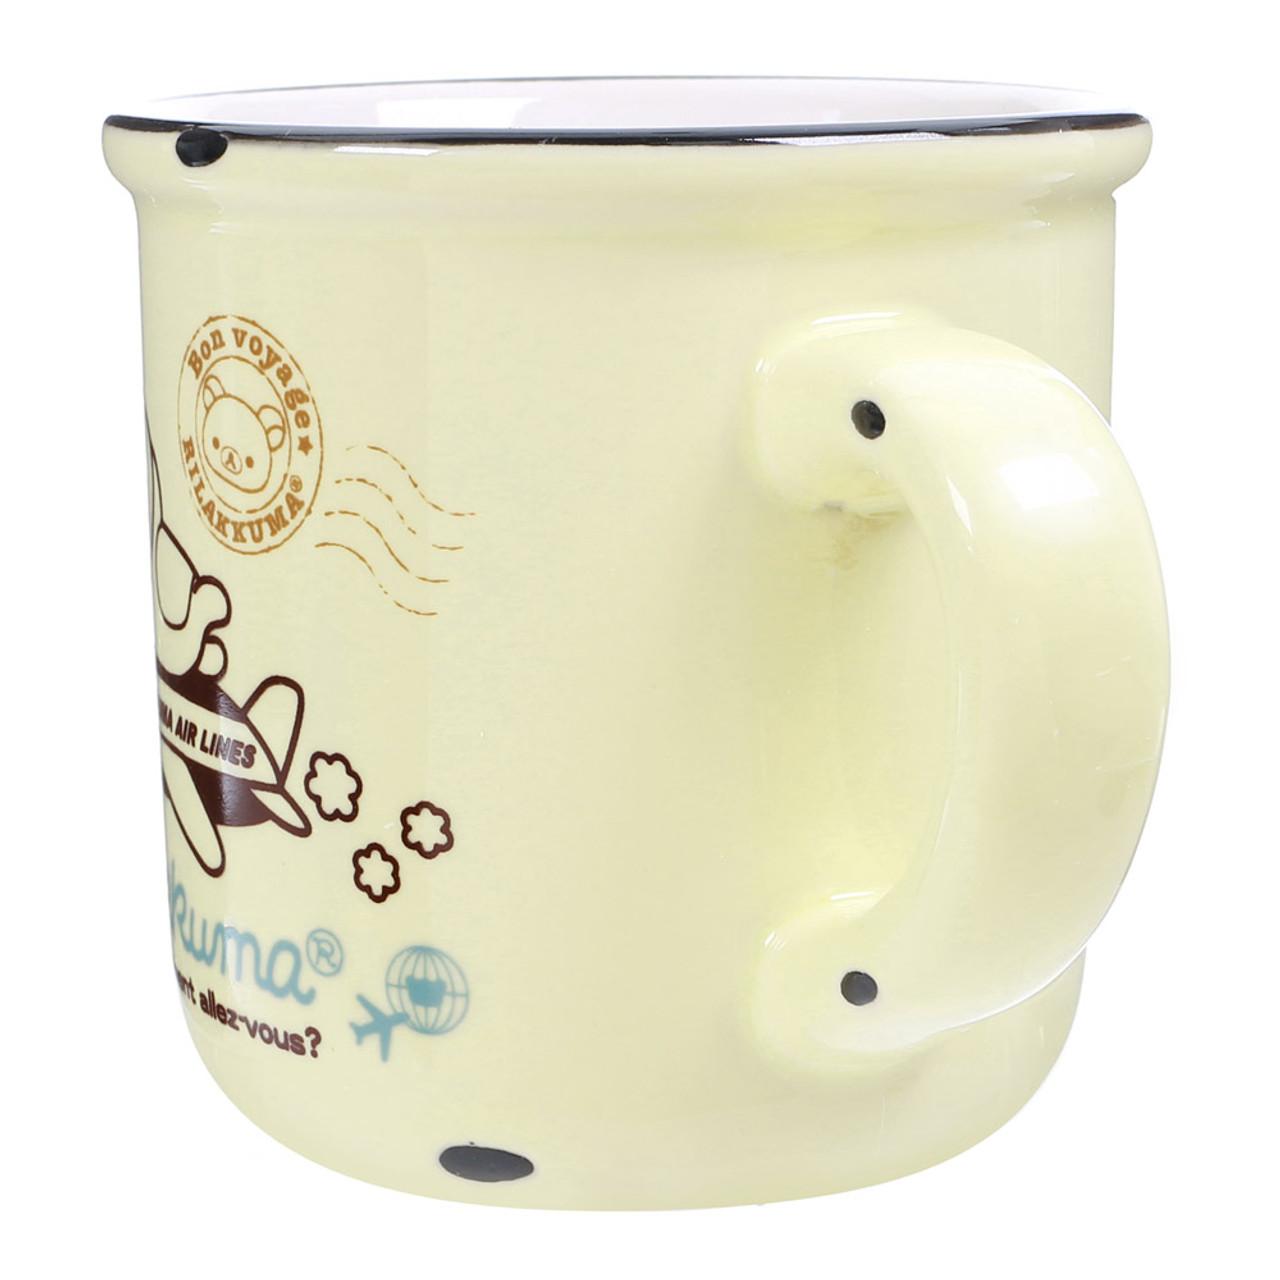 San-x Rilakkuma Cream Color Enamel Style Cup ( Side View )